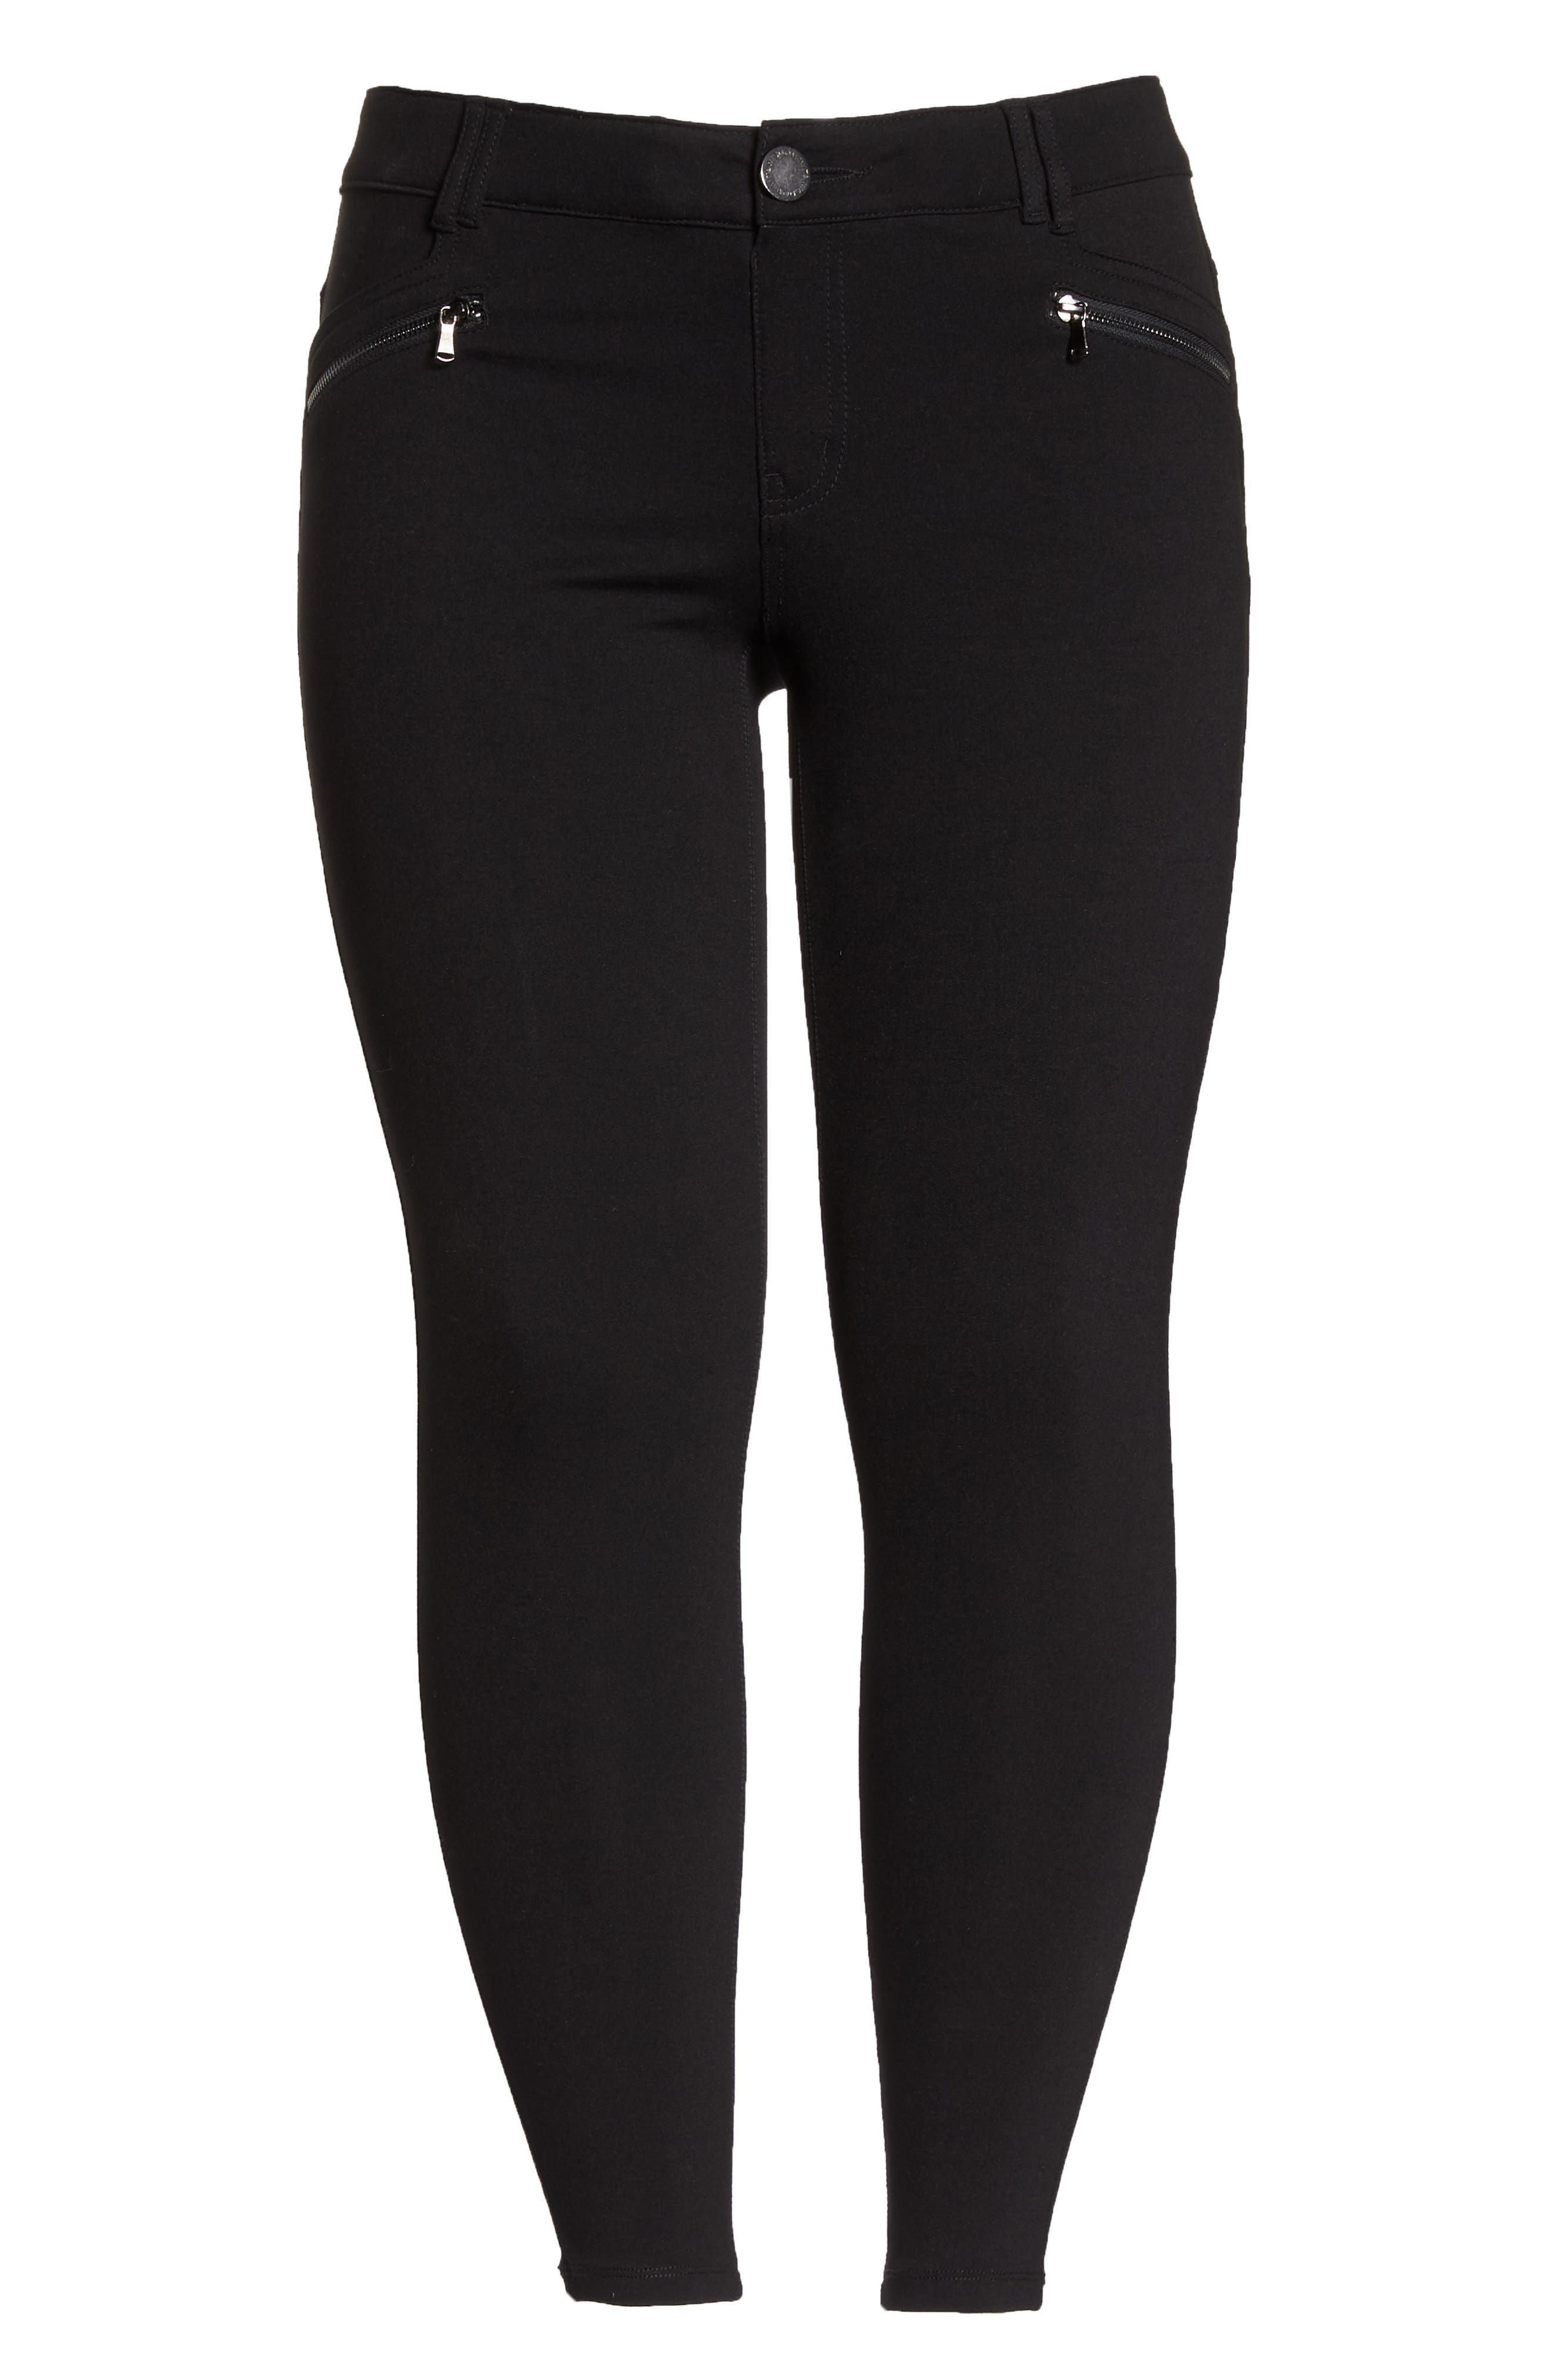 Ab-solution Zip Pocket Skinny Pants,                             Alternate thumbnail 7, color,                             002